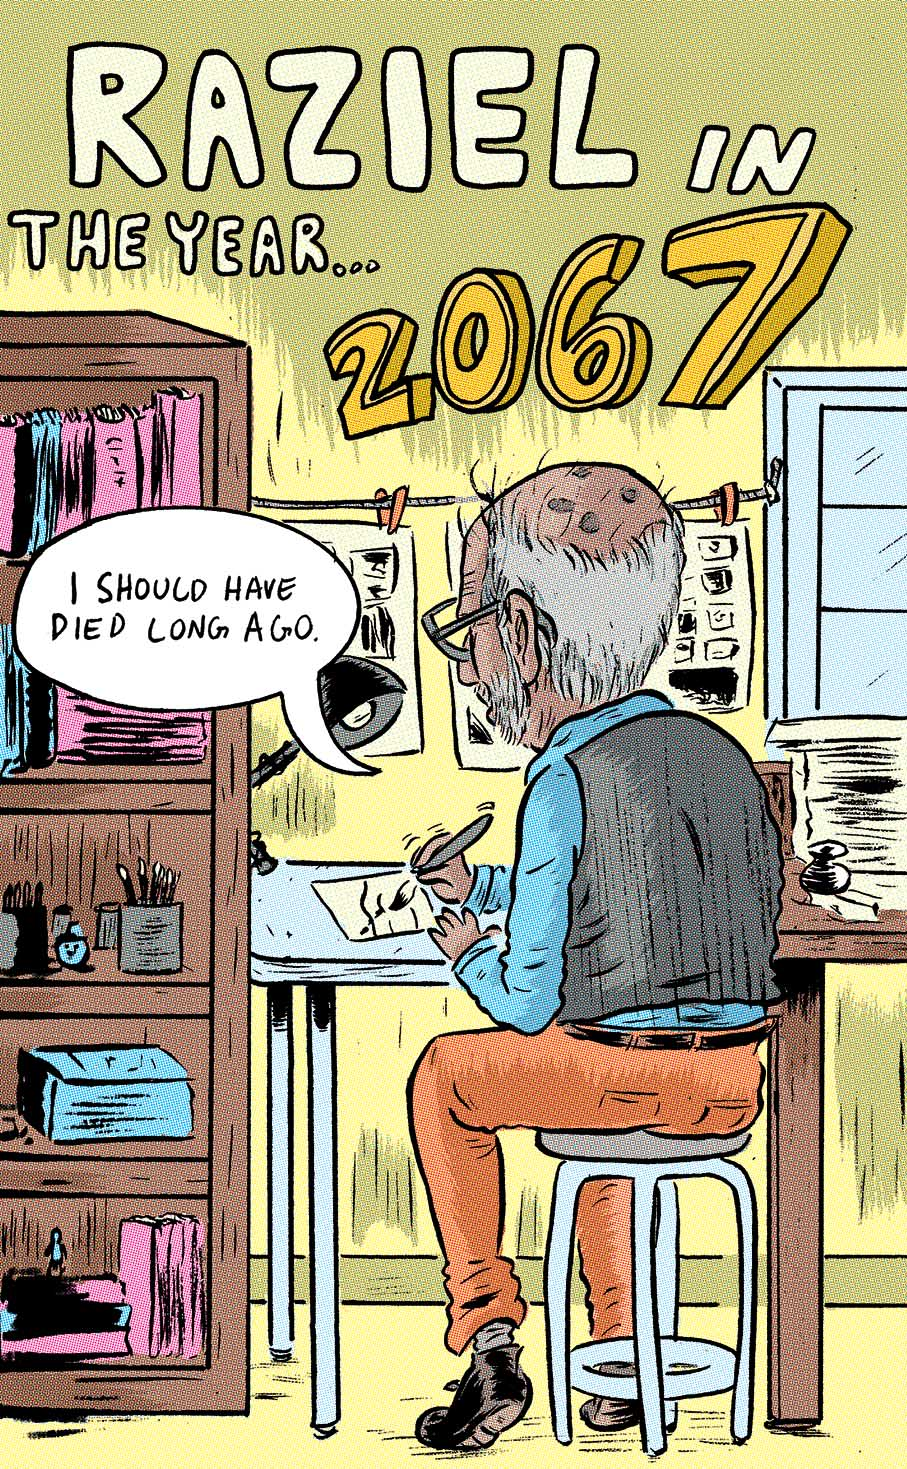 Raziel in the Year 2067